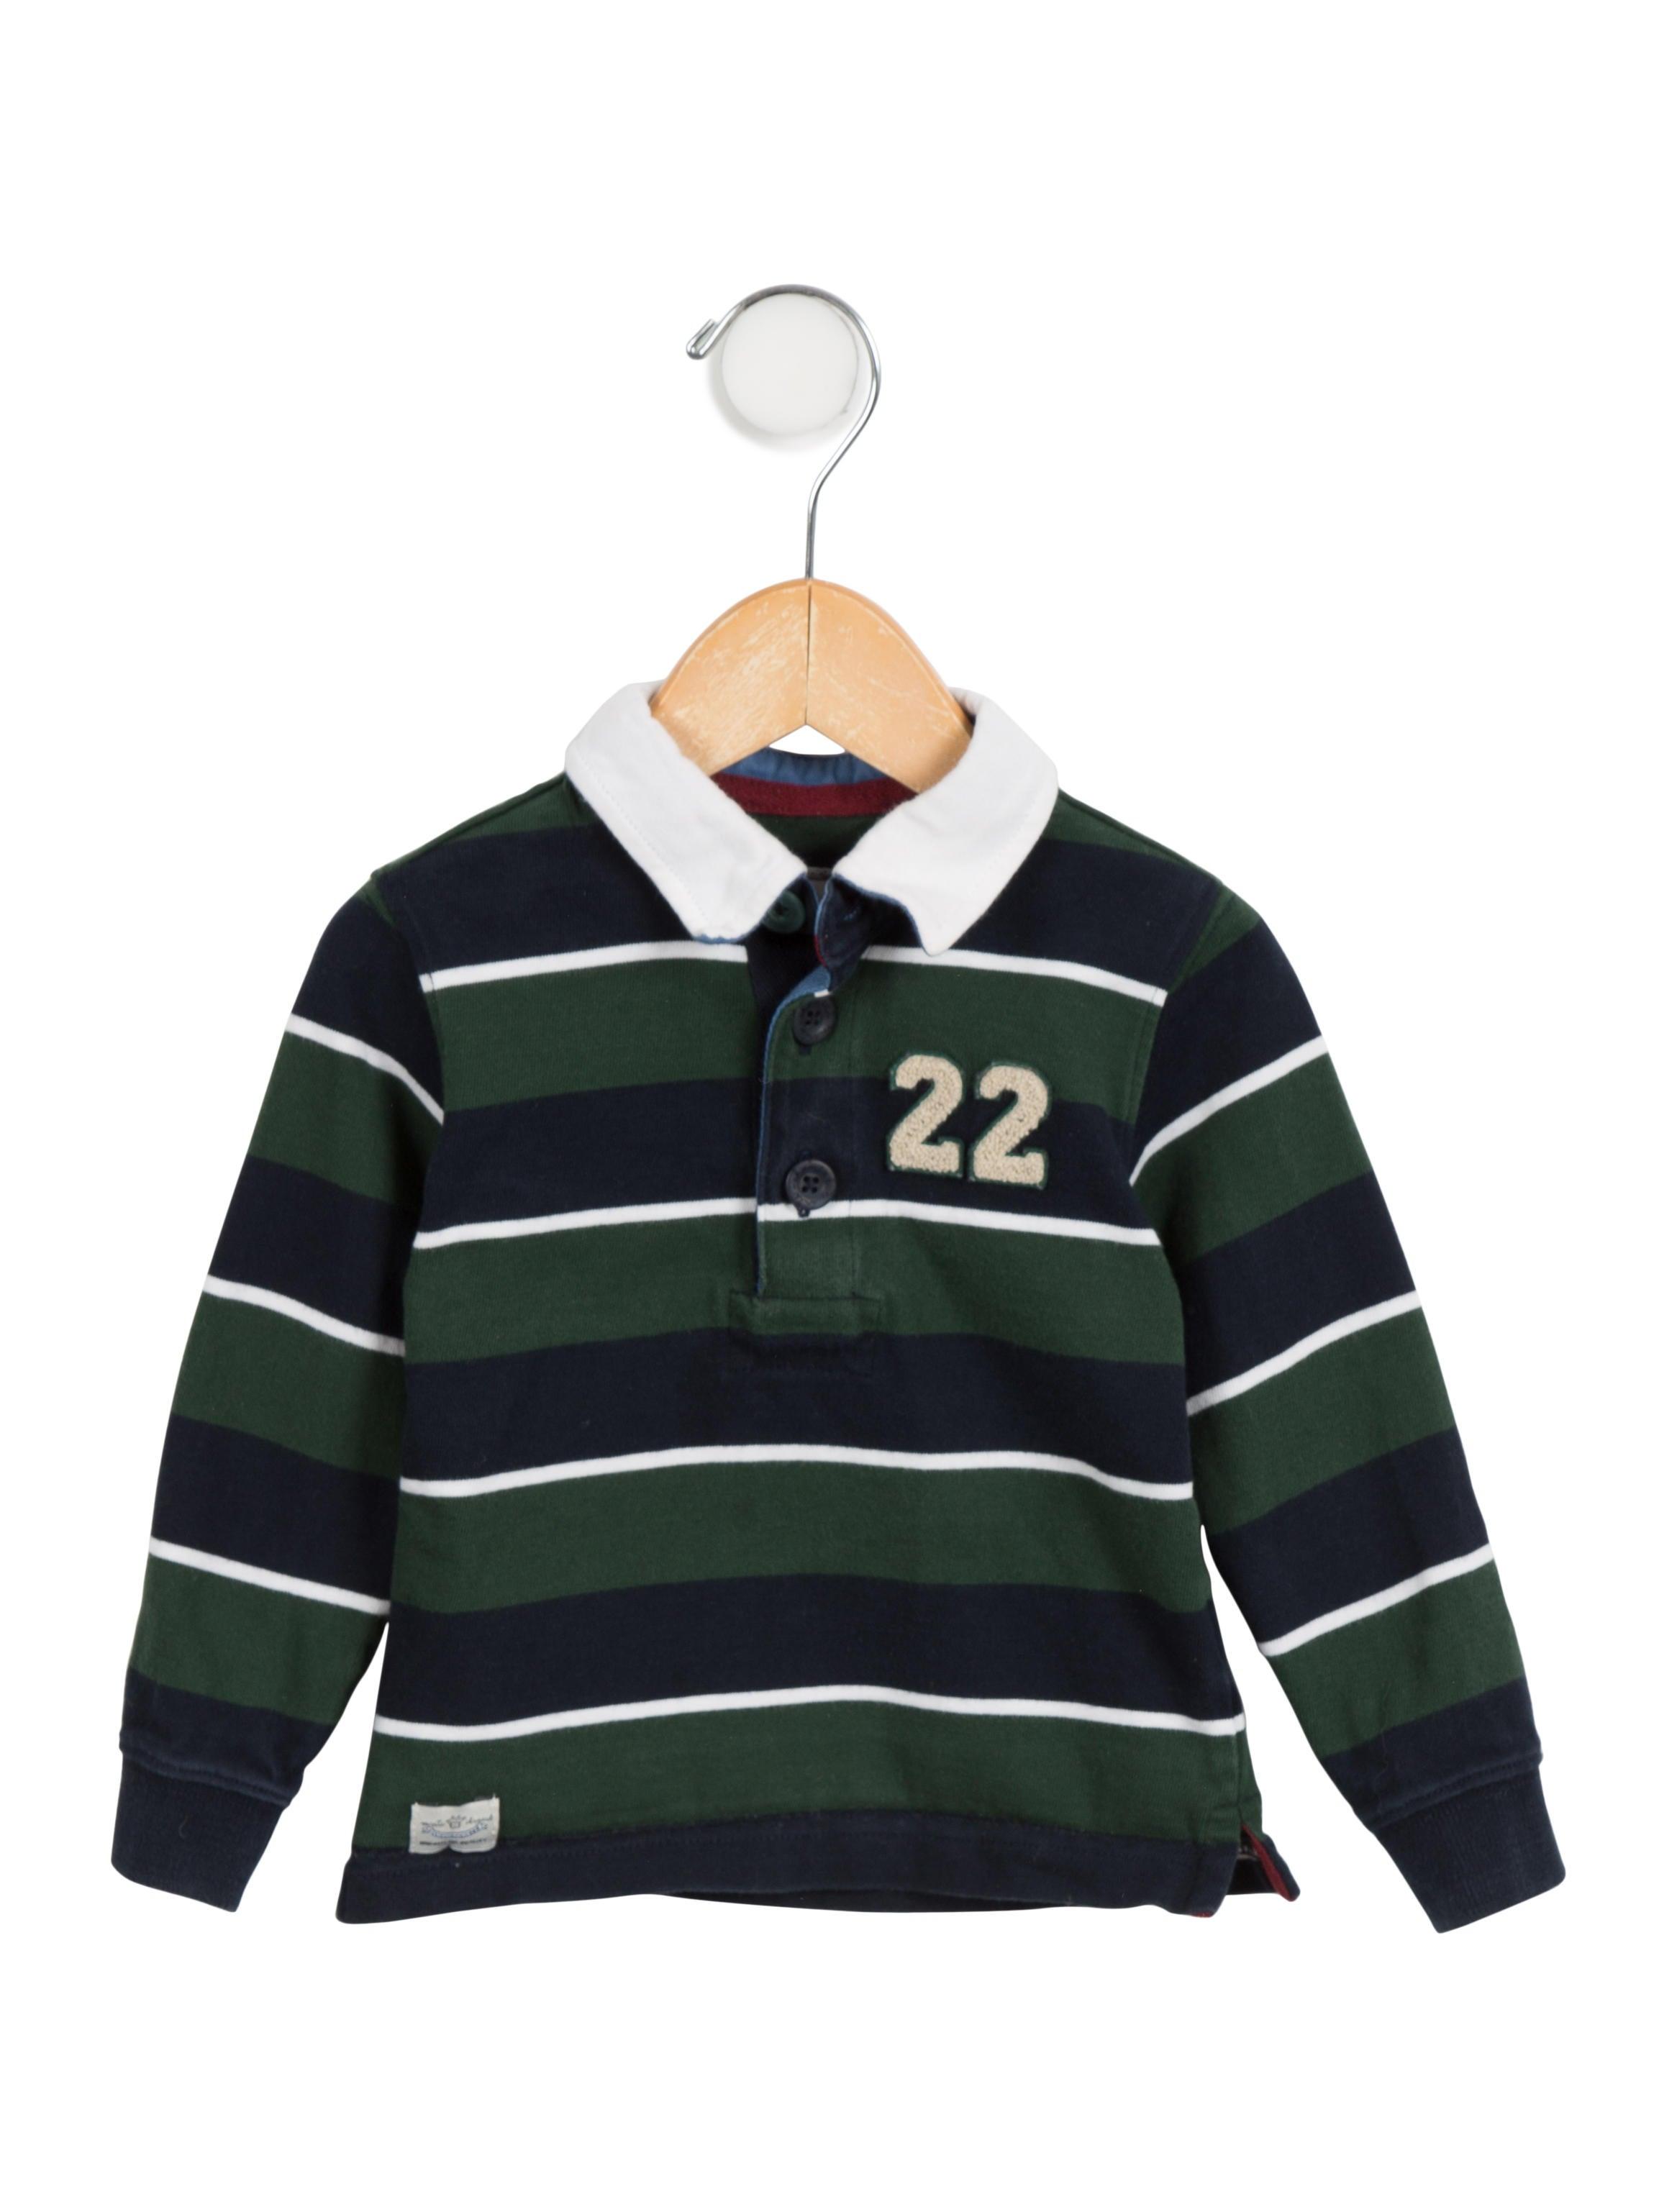 Marie Chantal Boys Striped Polo Shirt Boys March20303 The